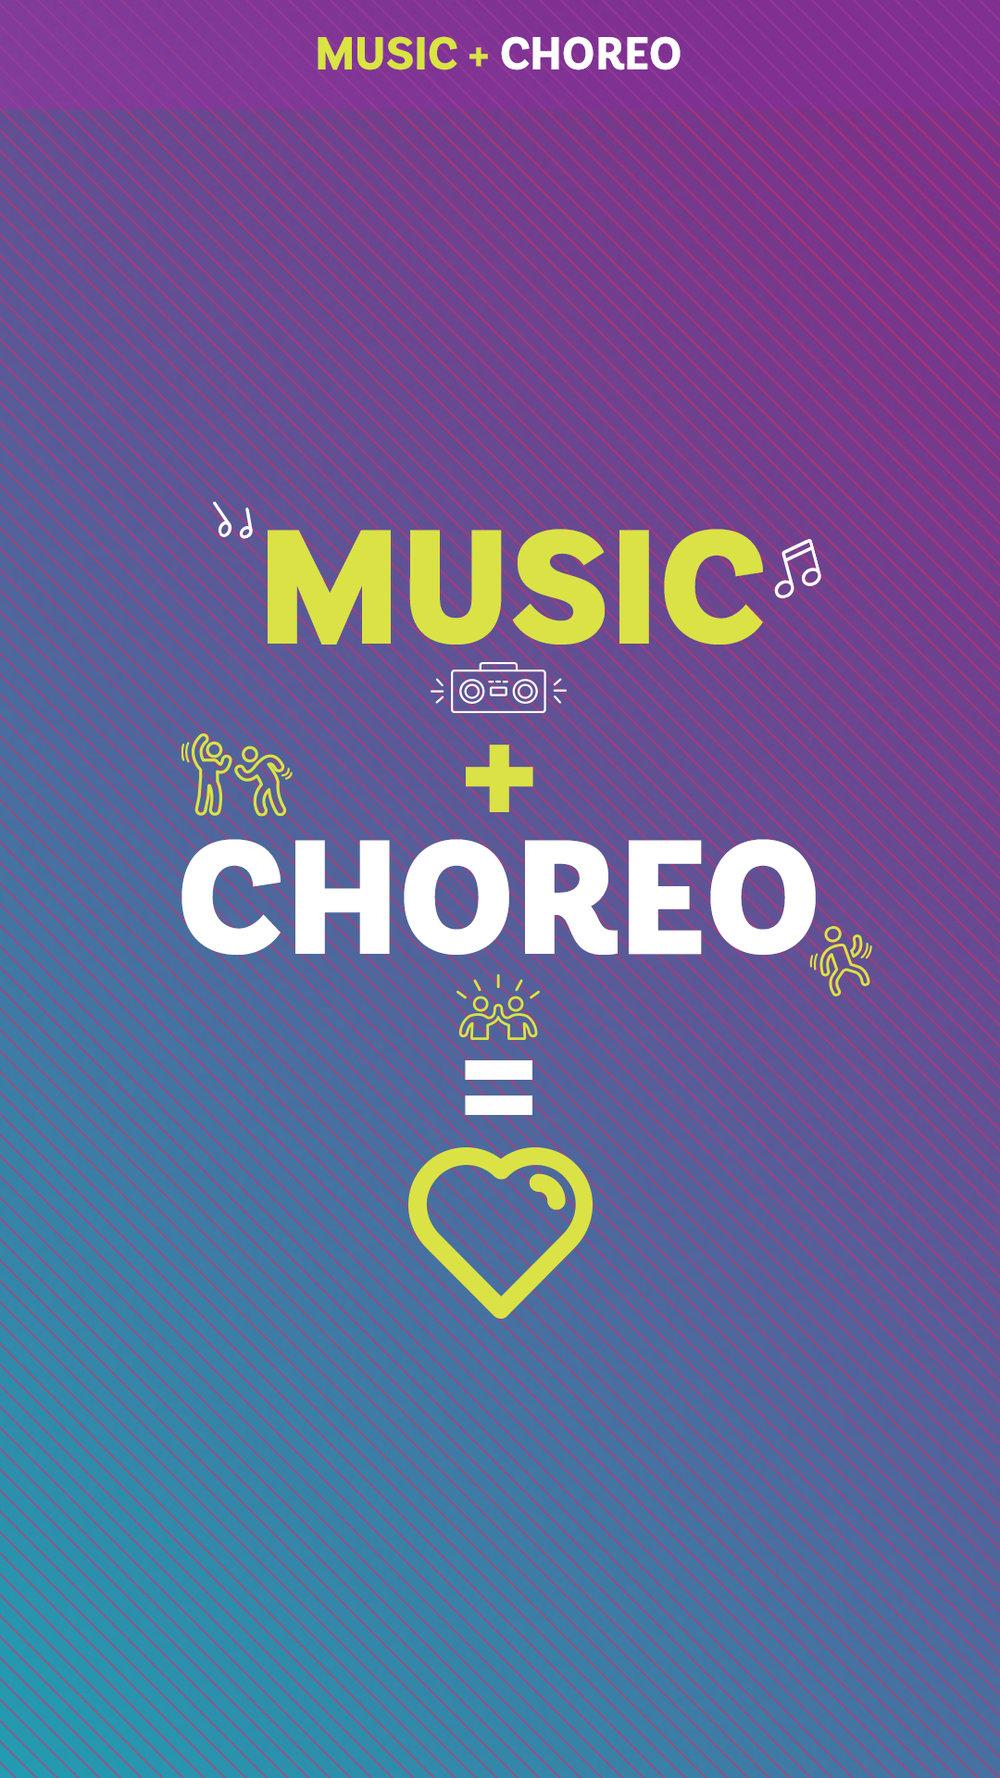 ZIN20182122_Music+Choreos_ZIN_Benefit_MEME_IG_STORY1.jpg